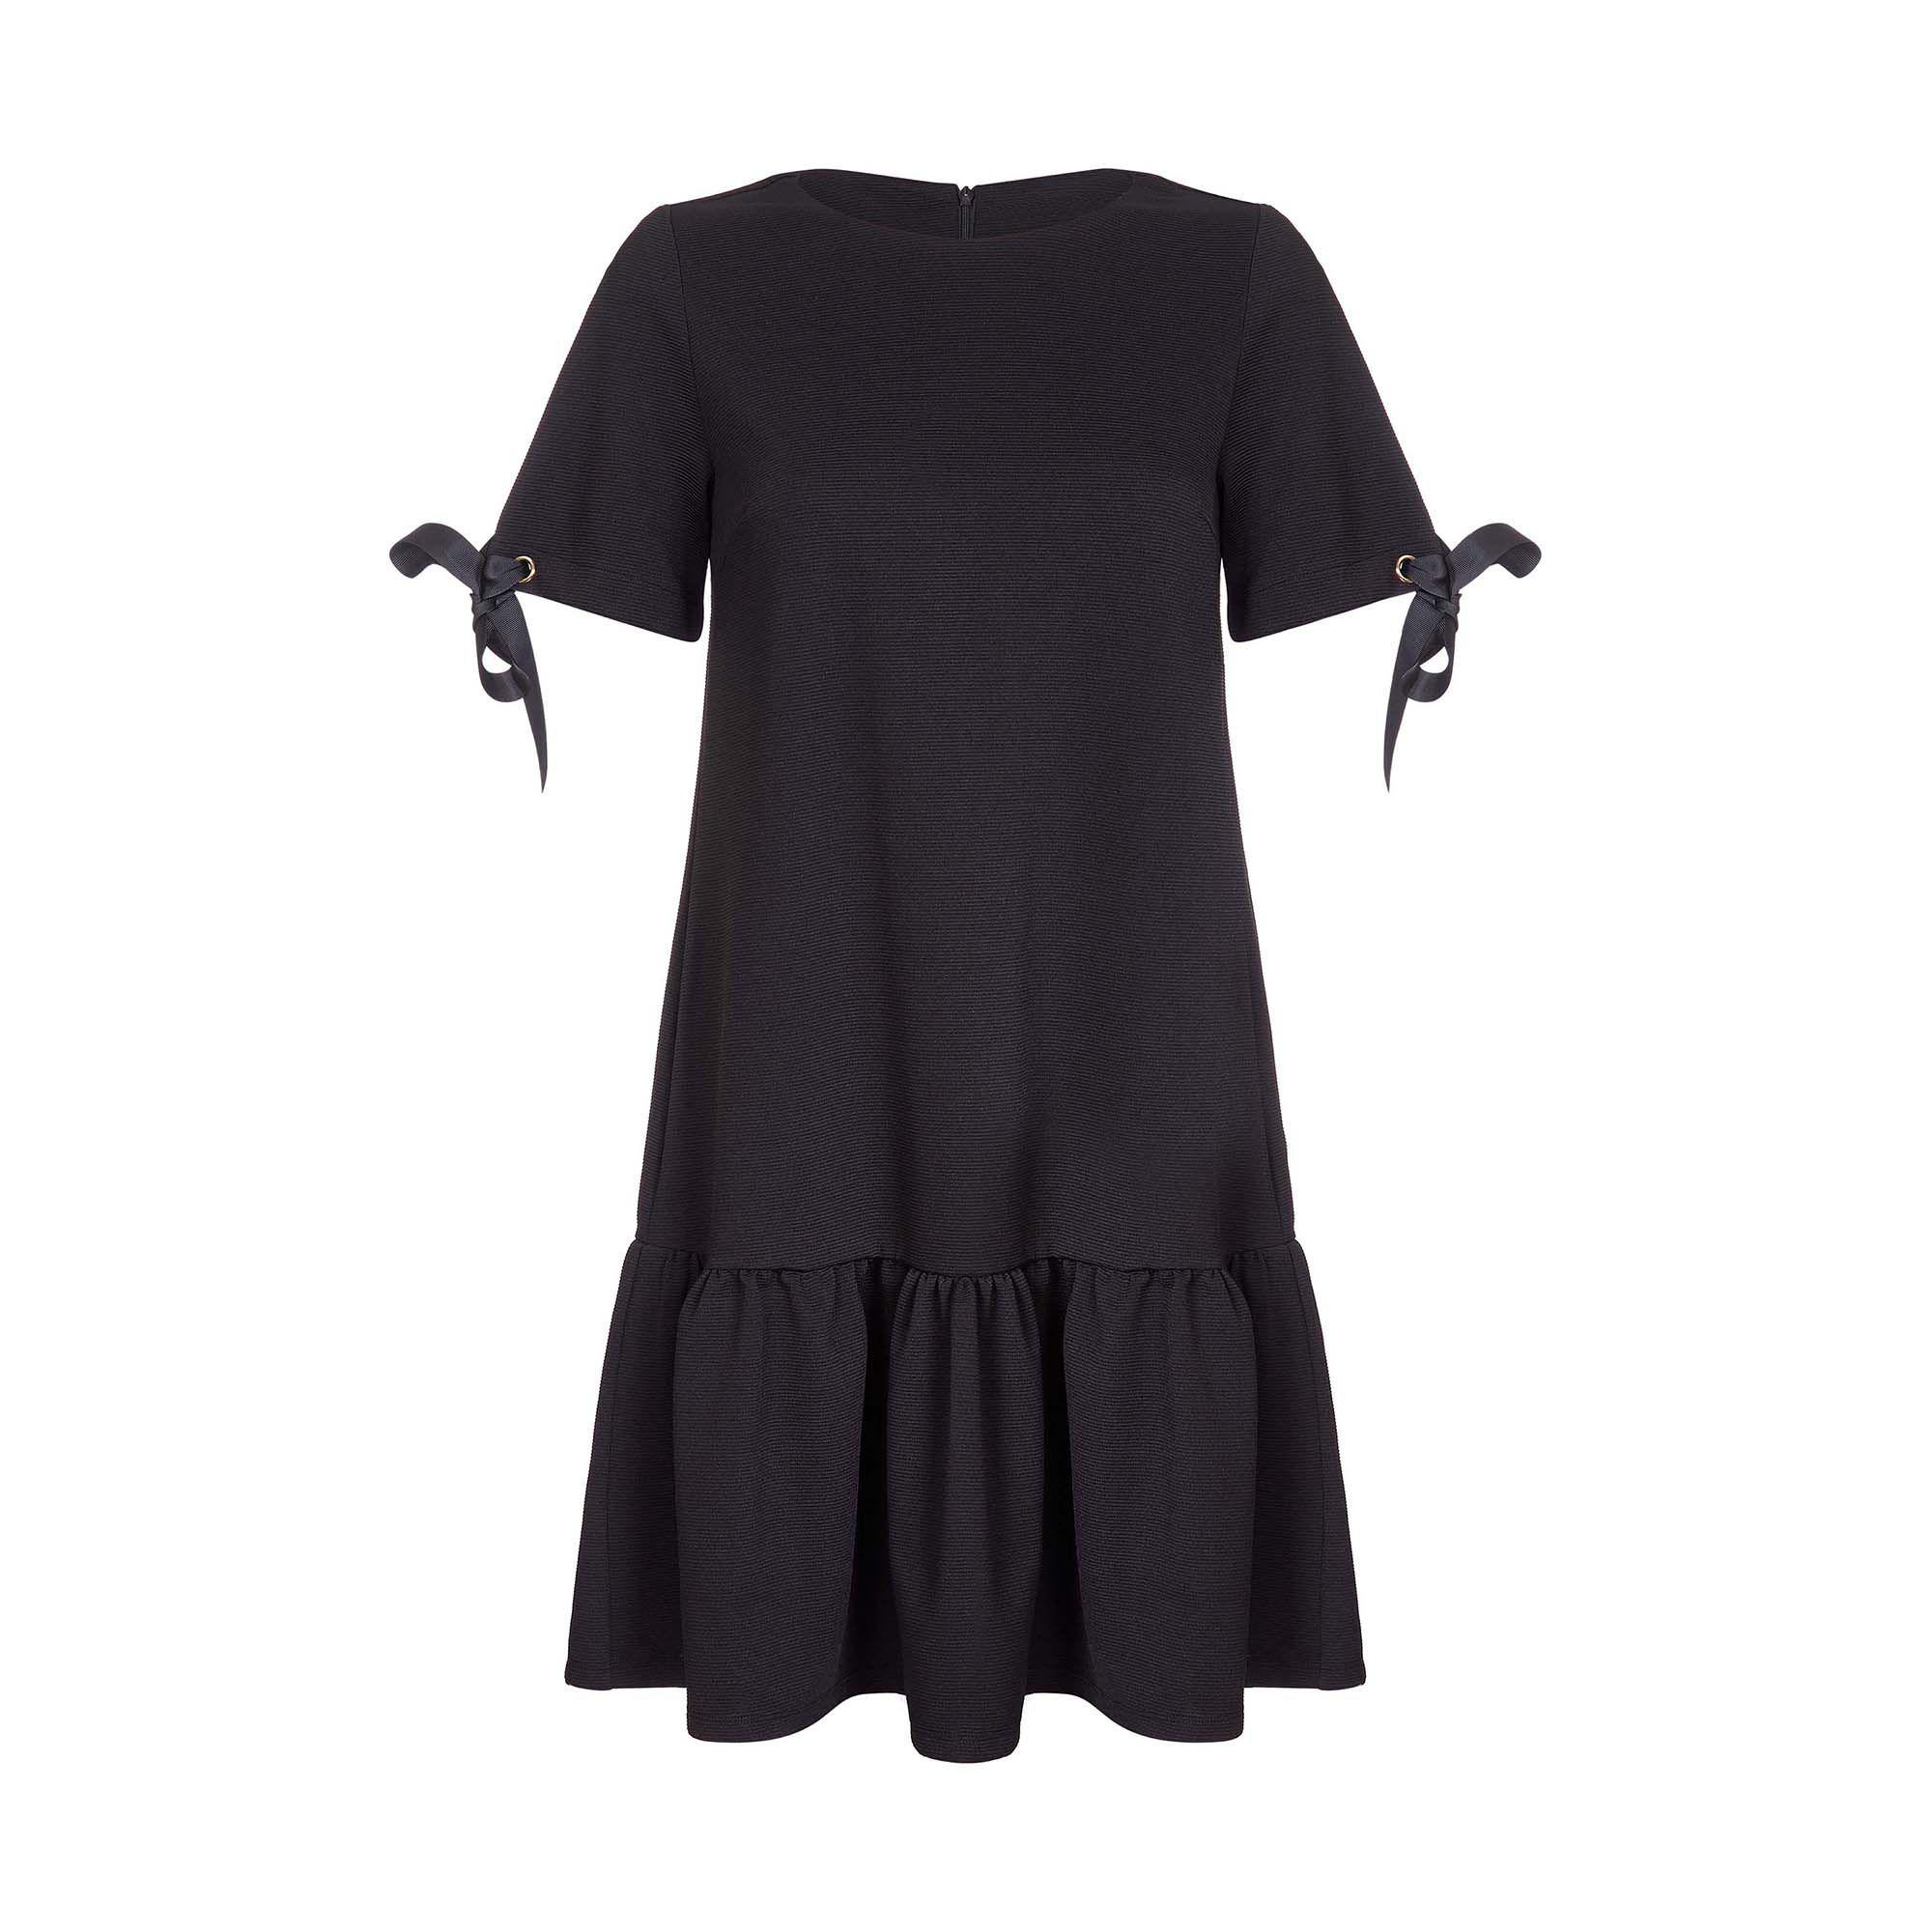 982176cd014 Yumi  - Black Ribbed Ponte  arliss  Tunic Dress - Lyst. View fullscreen